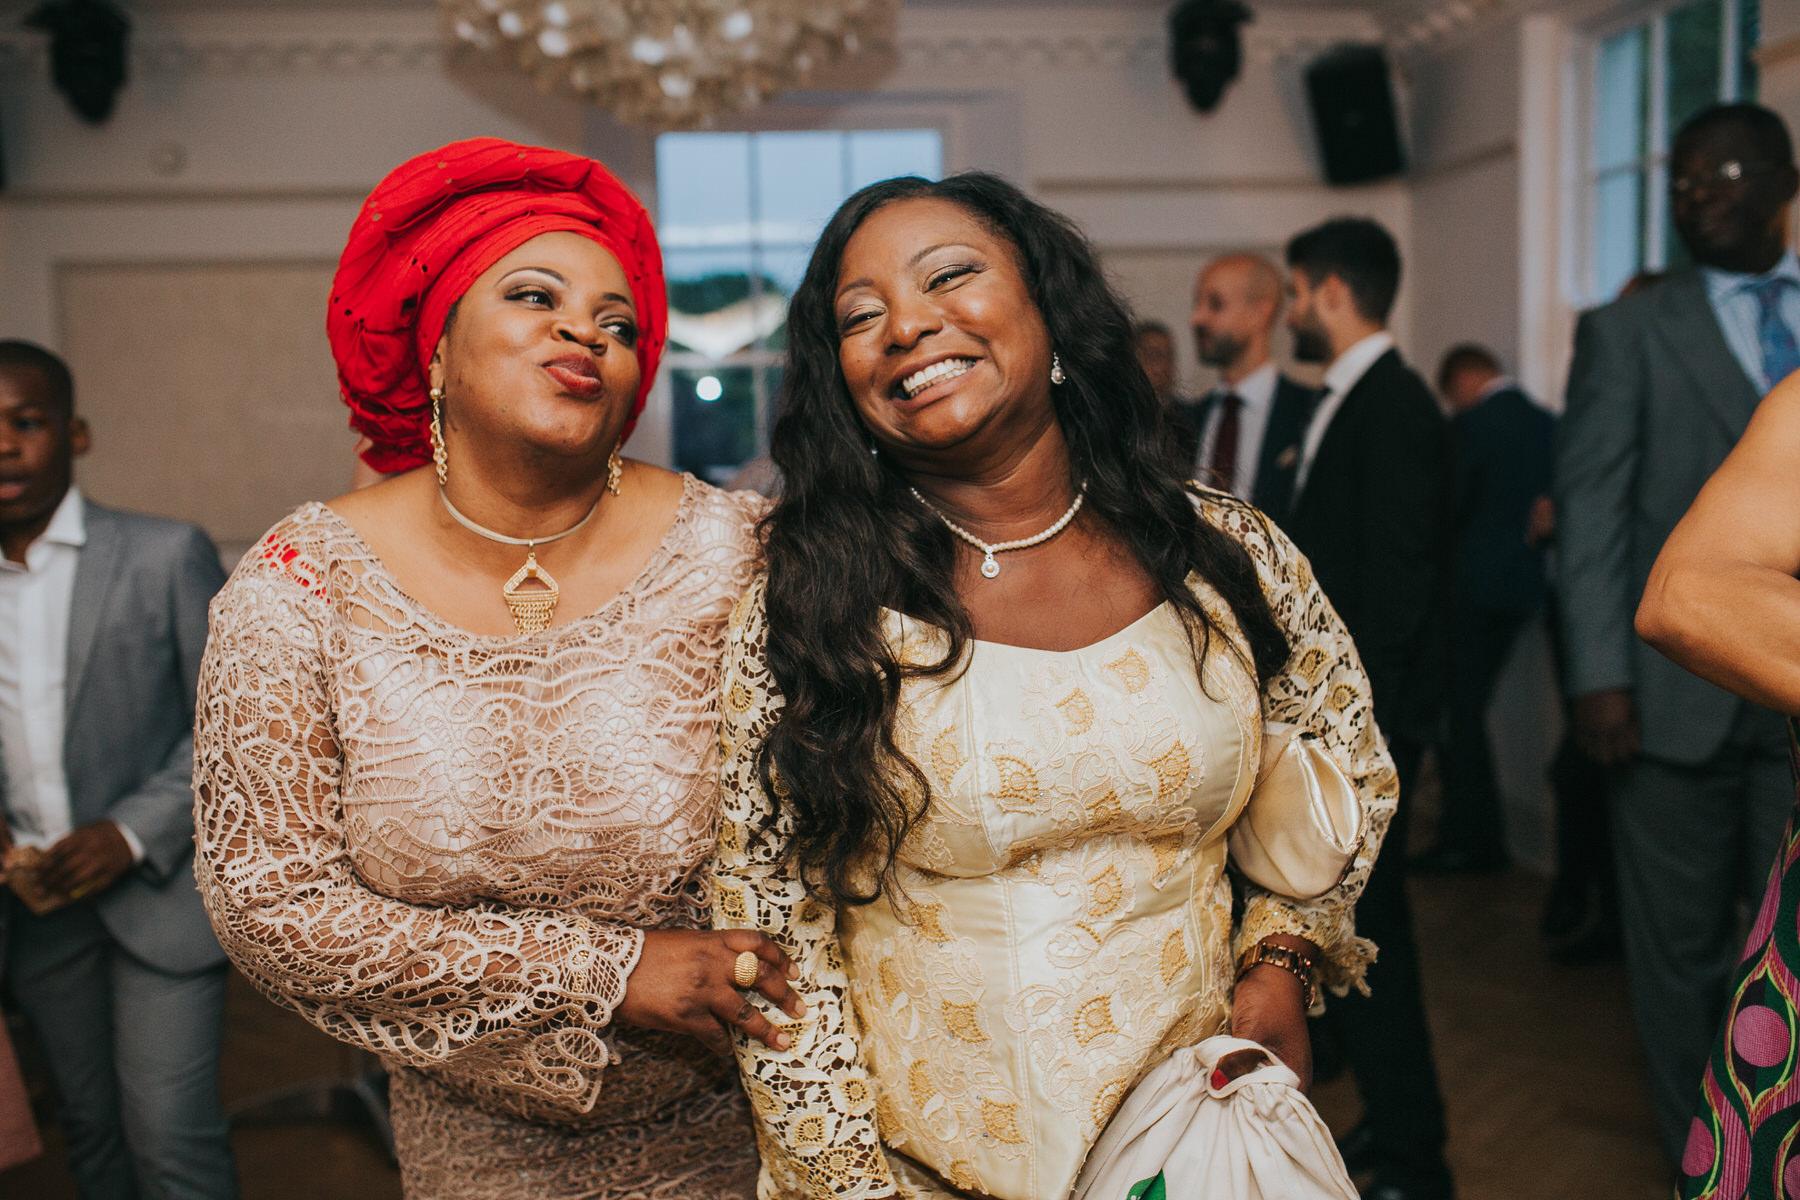 Belair House weddings guest candid portrait.jpg